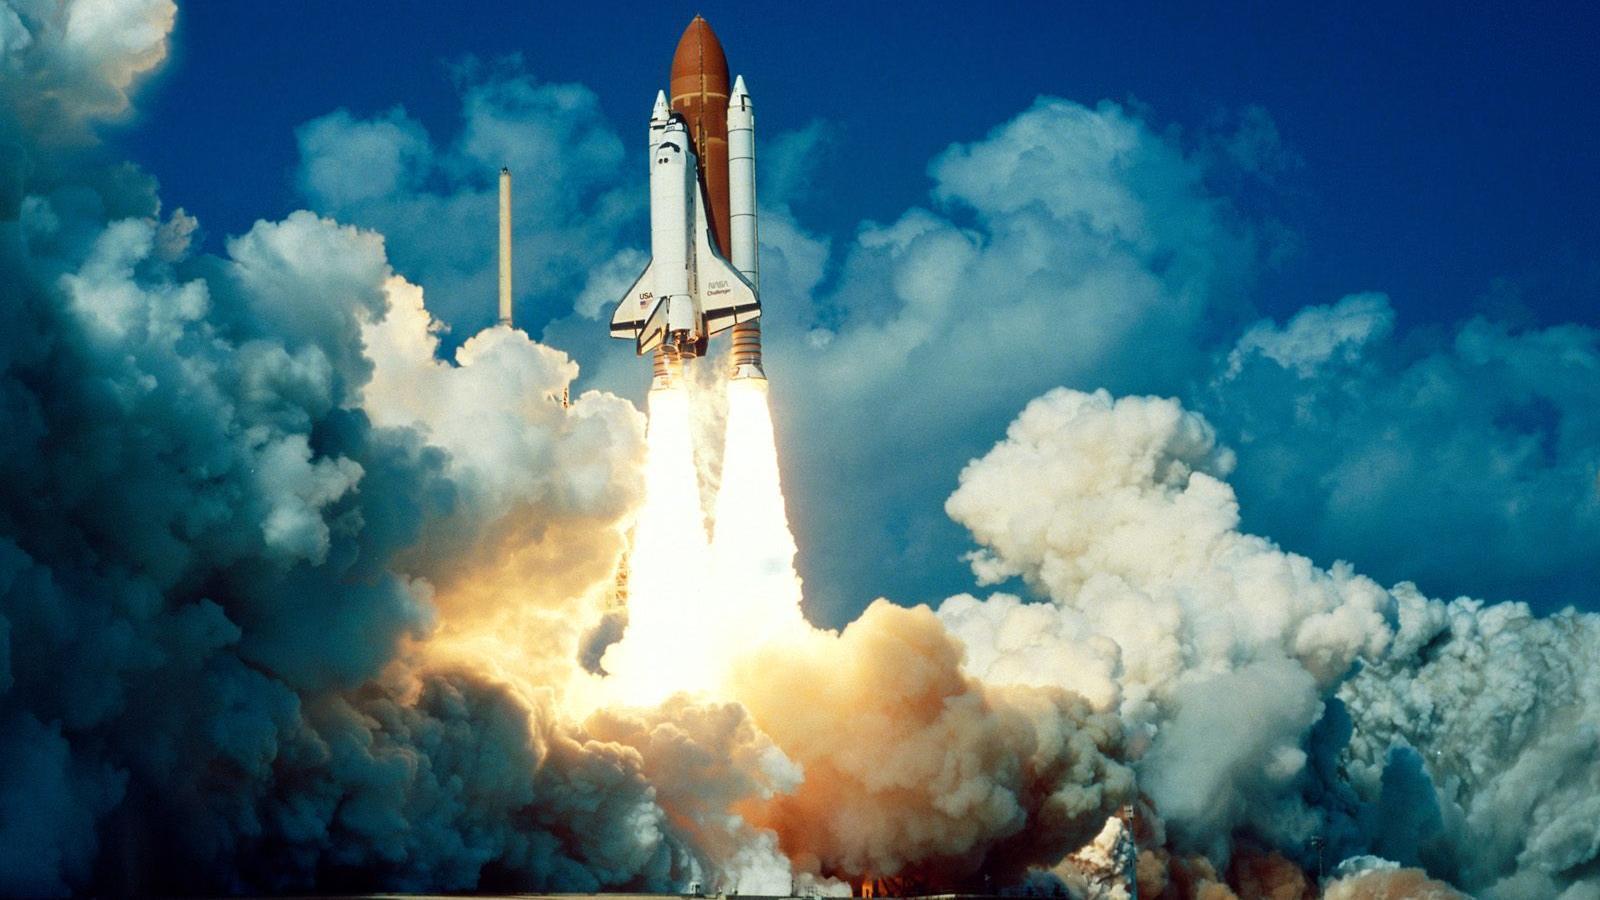 Space Shuttle Wallpapers - Space Shuttle Wallpaper Hd , HD Wallpaper & Backgrounds